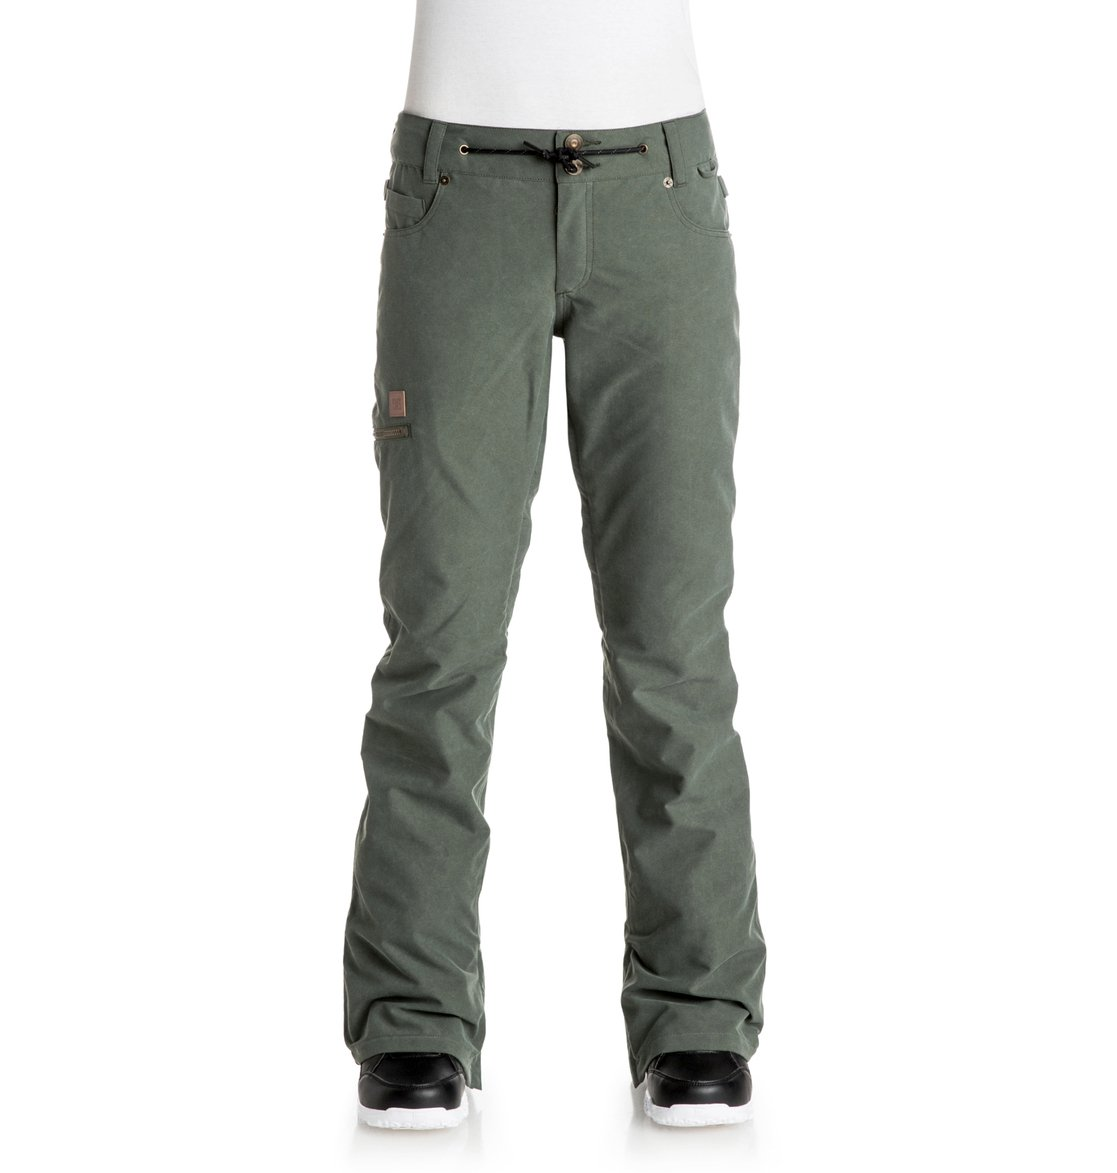 c3451c8b Mujeres Pantalones de Nieve Viva